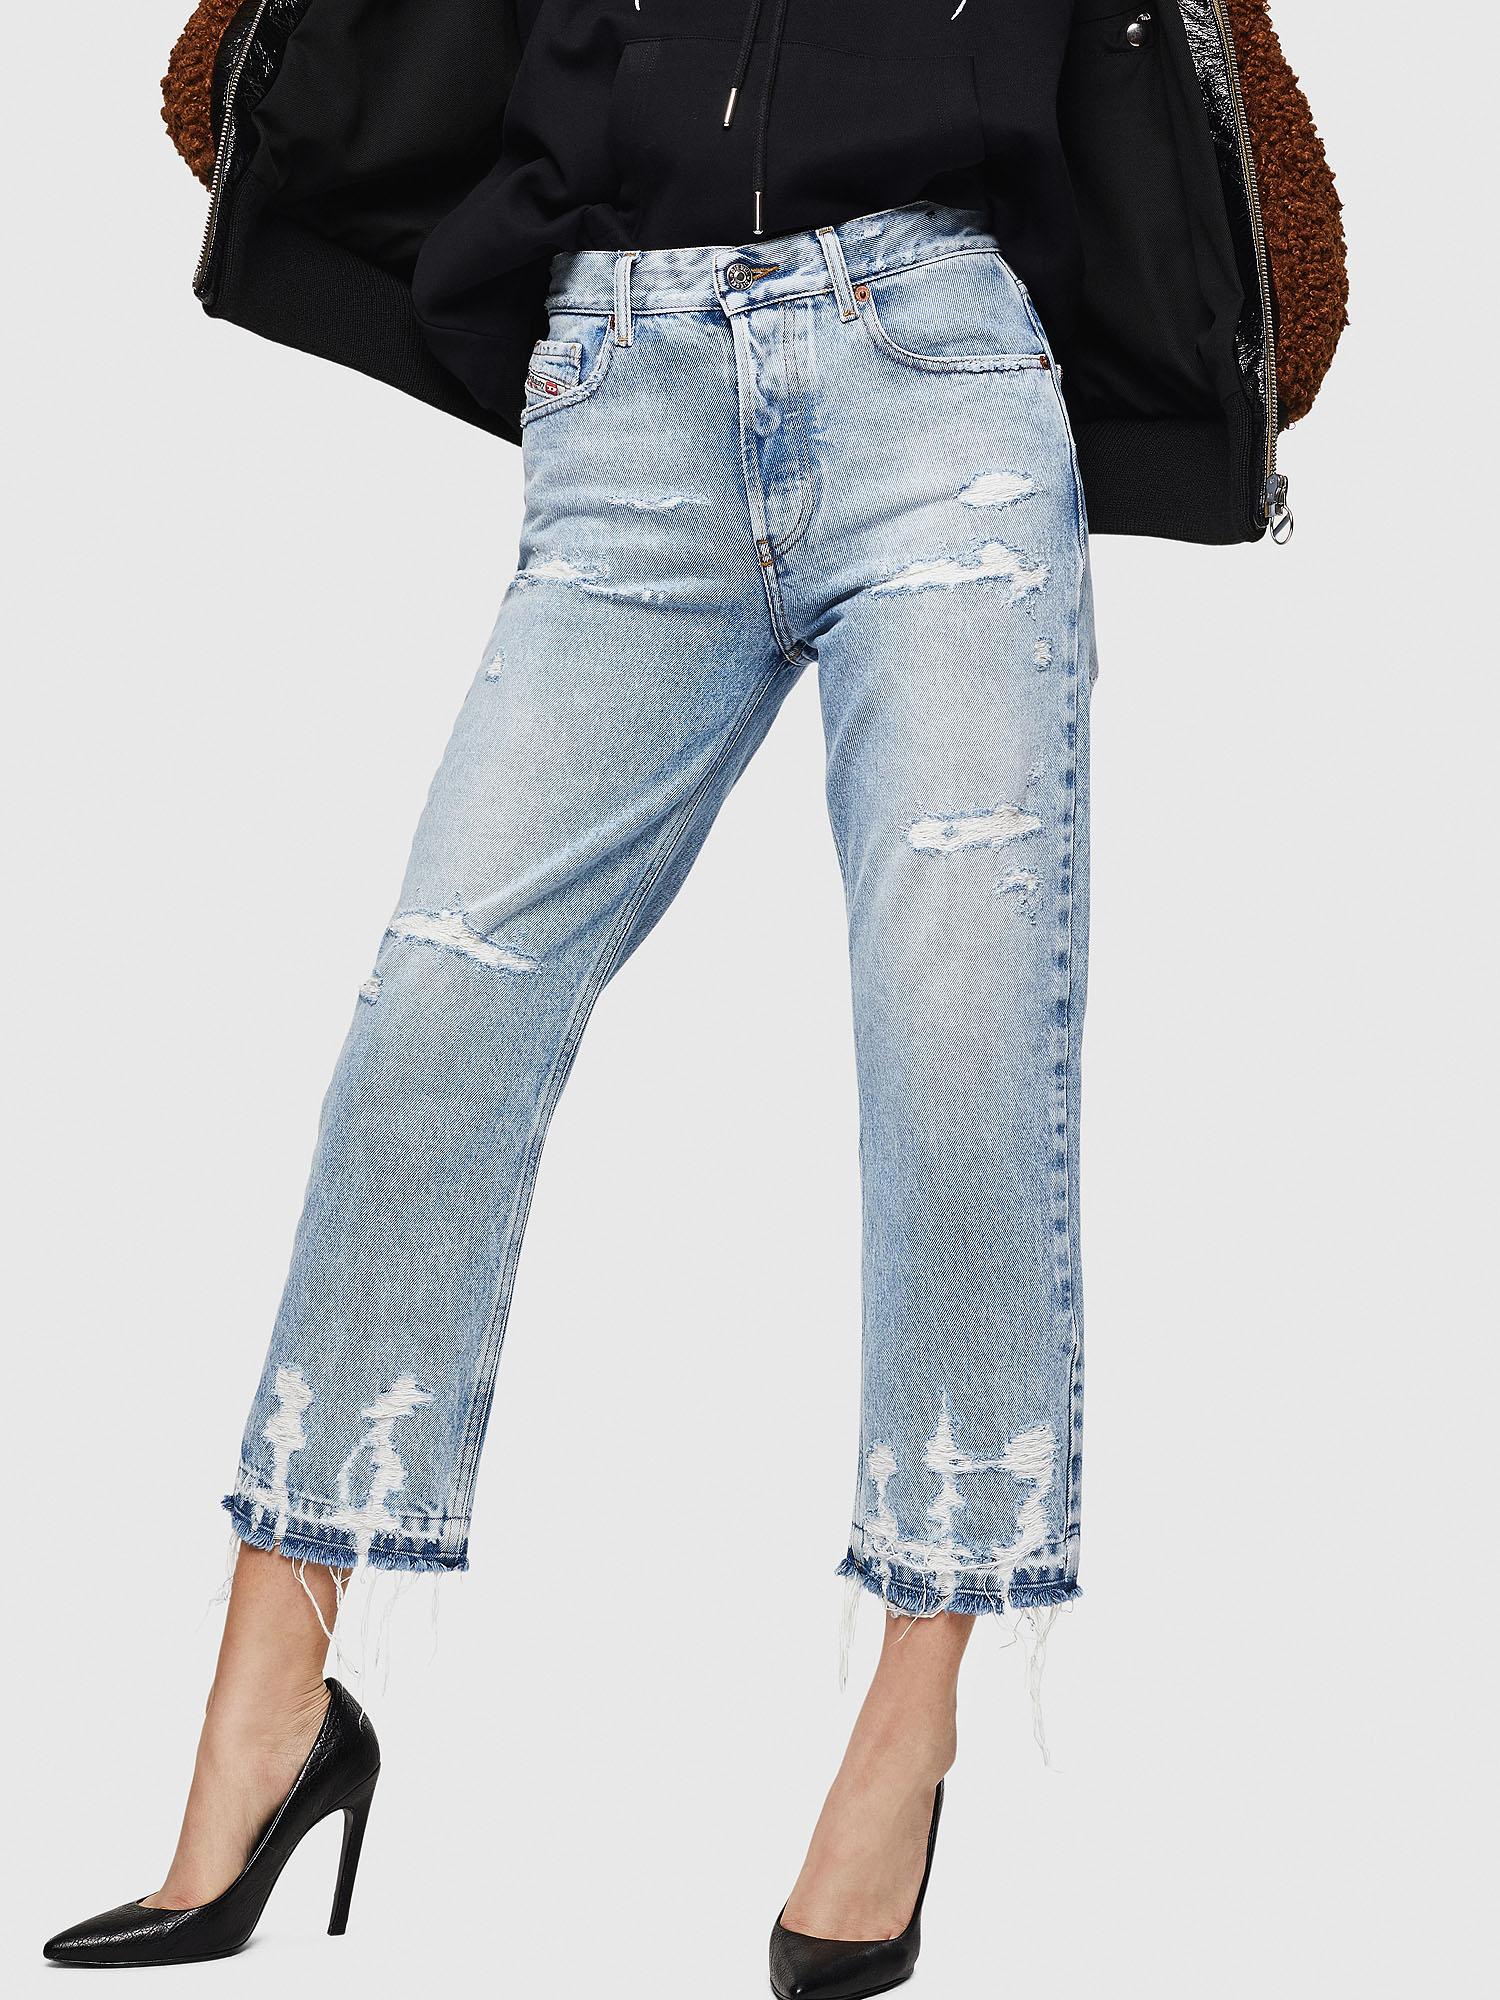 Diesel ARYEL-SP Jeans 0078L - Blue - 25